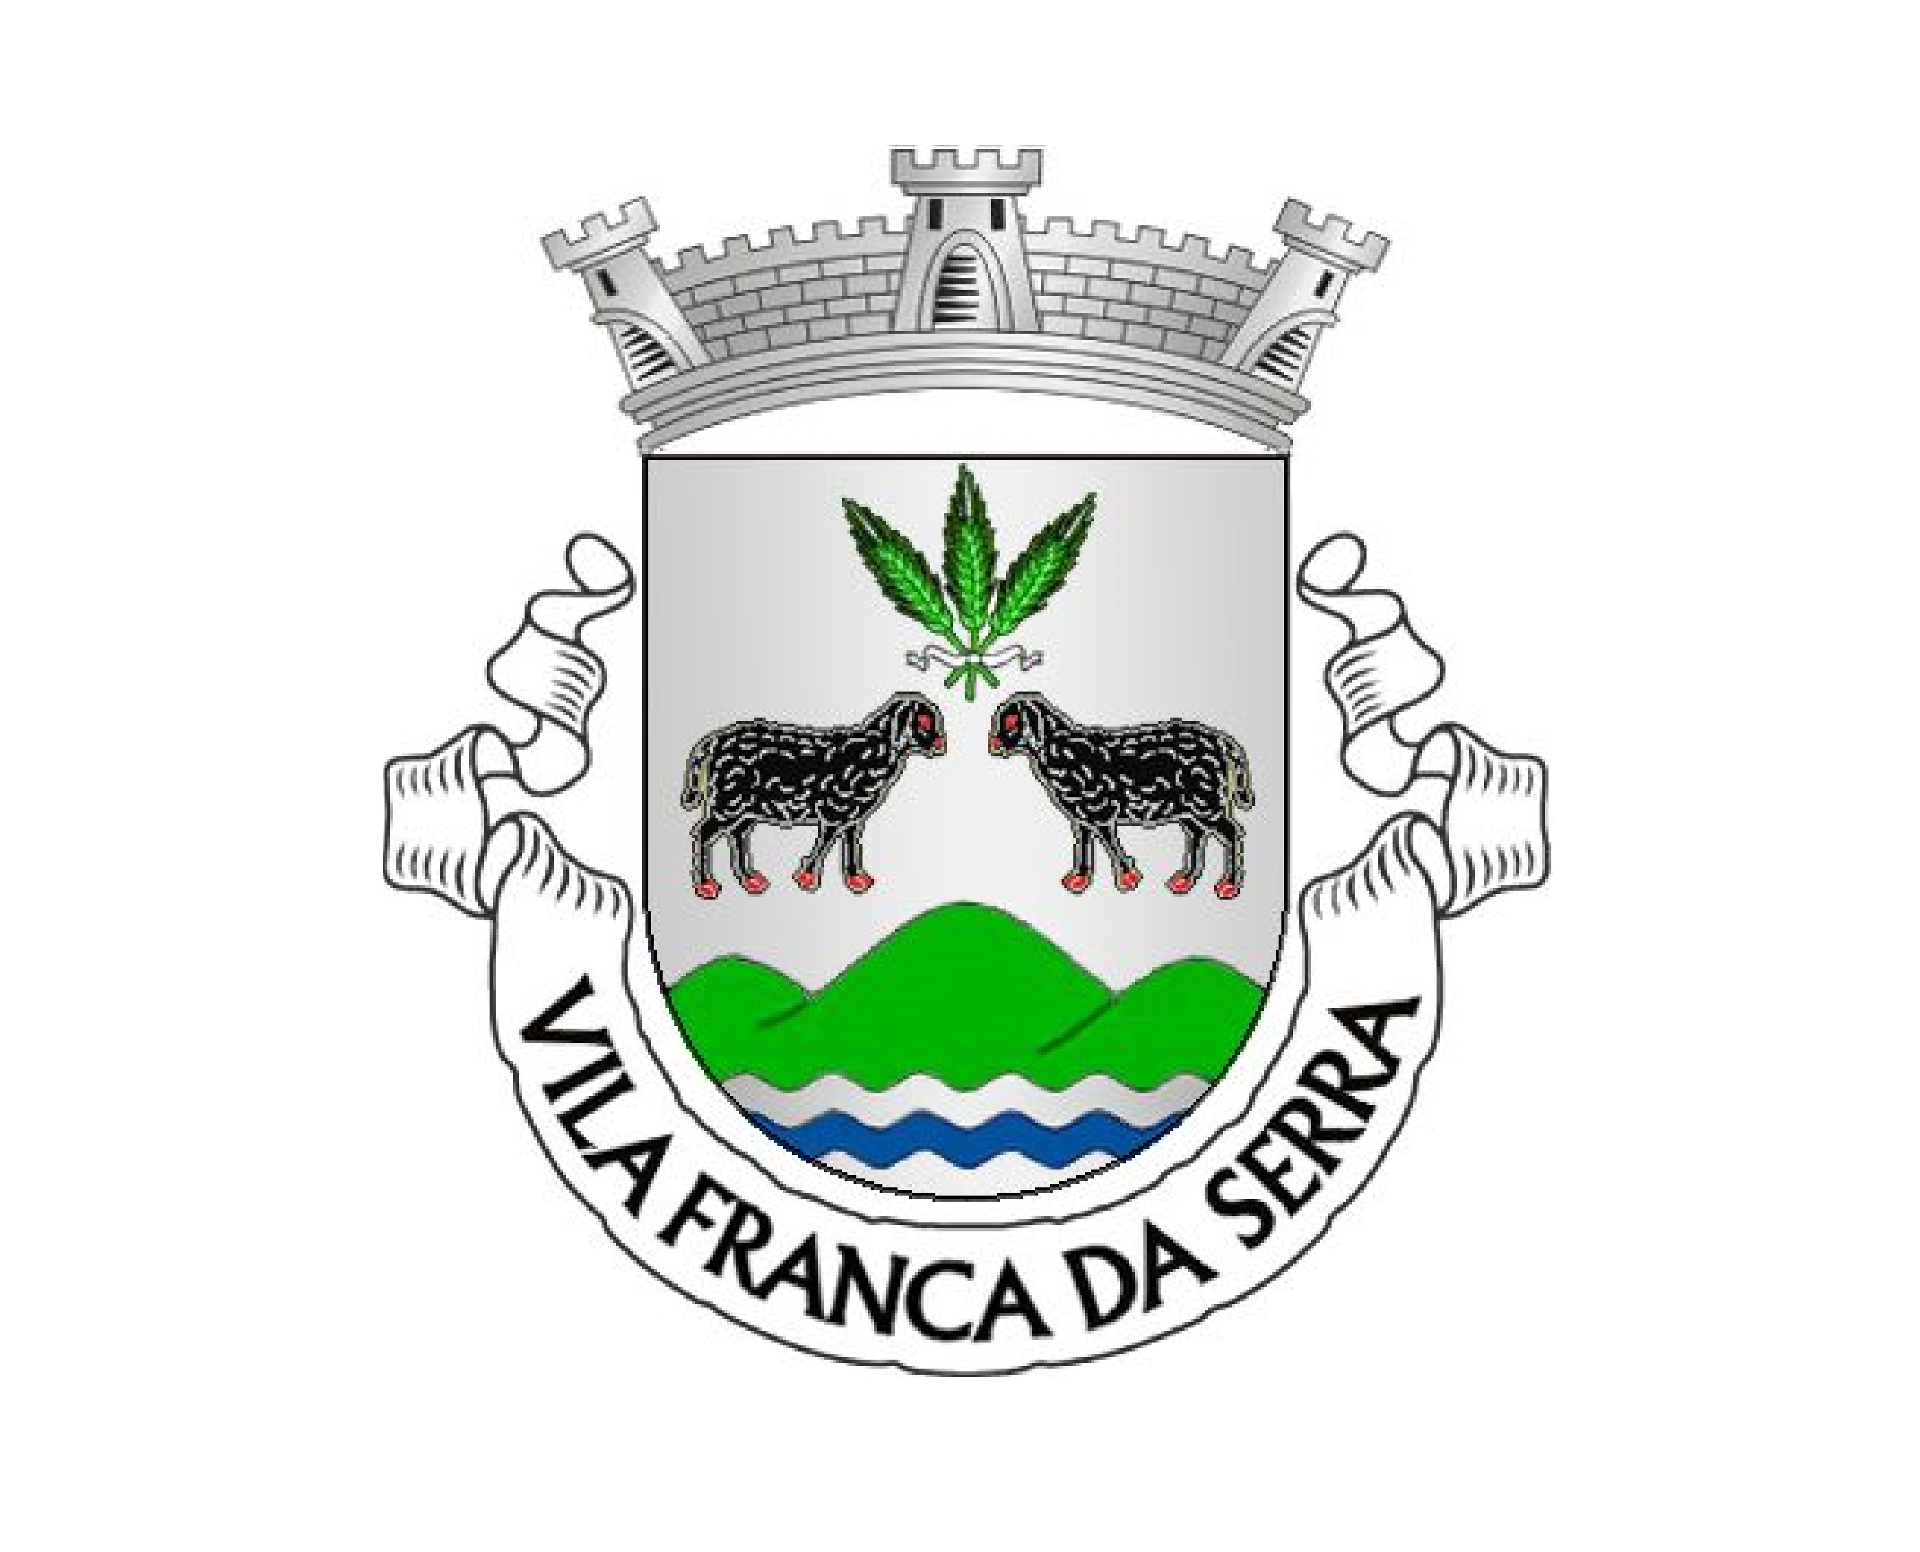 Brasão Vila Franca da Serra